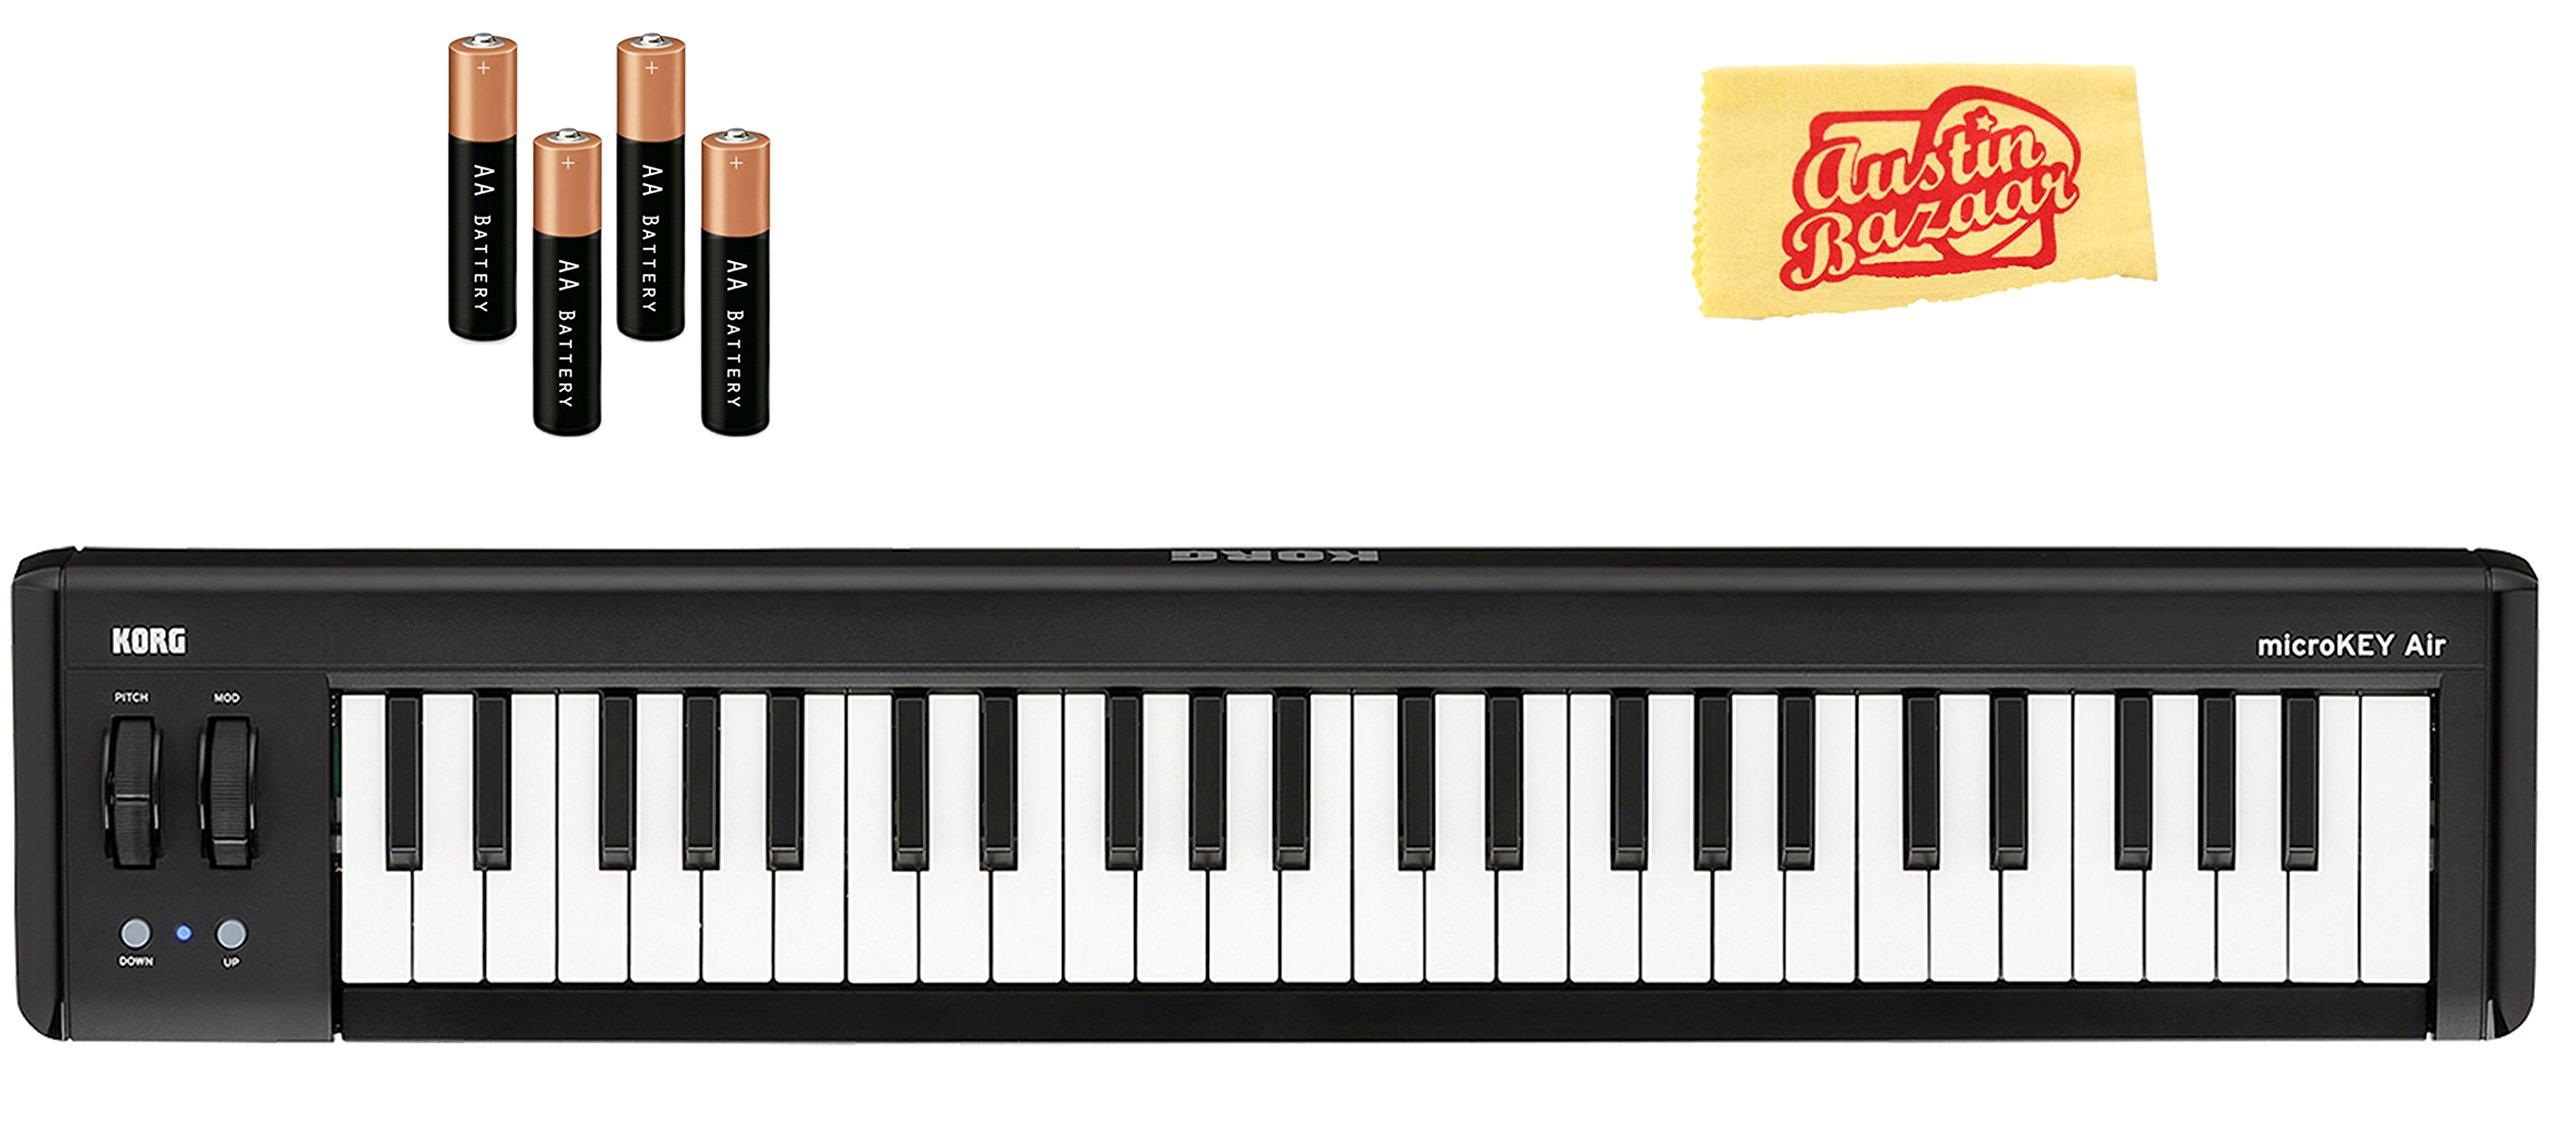 Korg microKEY Air 49-Key Wireless MIDI Controller Bundle with AA Batteries and Austin Bazaar Polishing Cloth